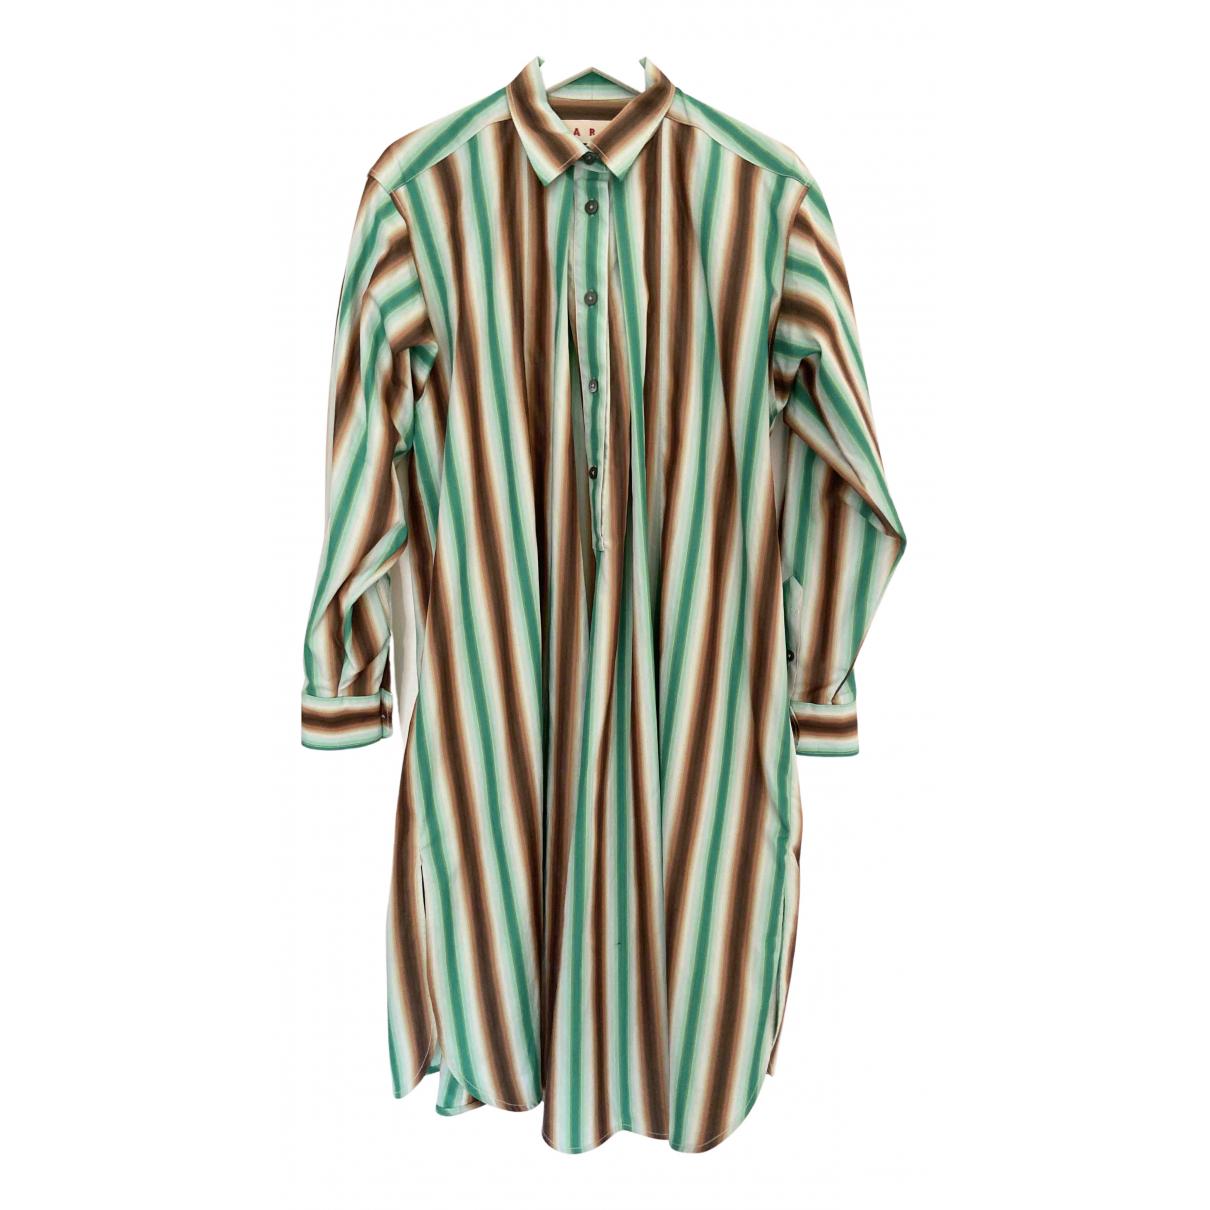 Marni \N Kleid in  Gruen Baumwolle